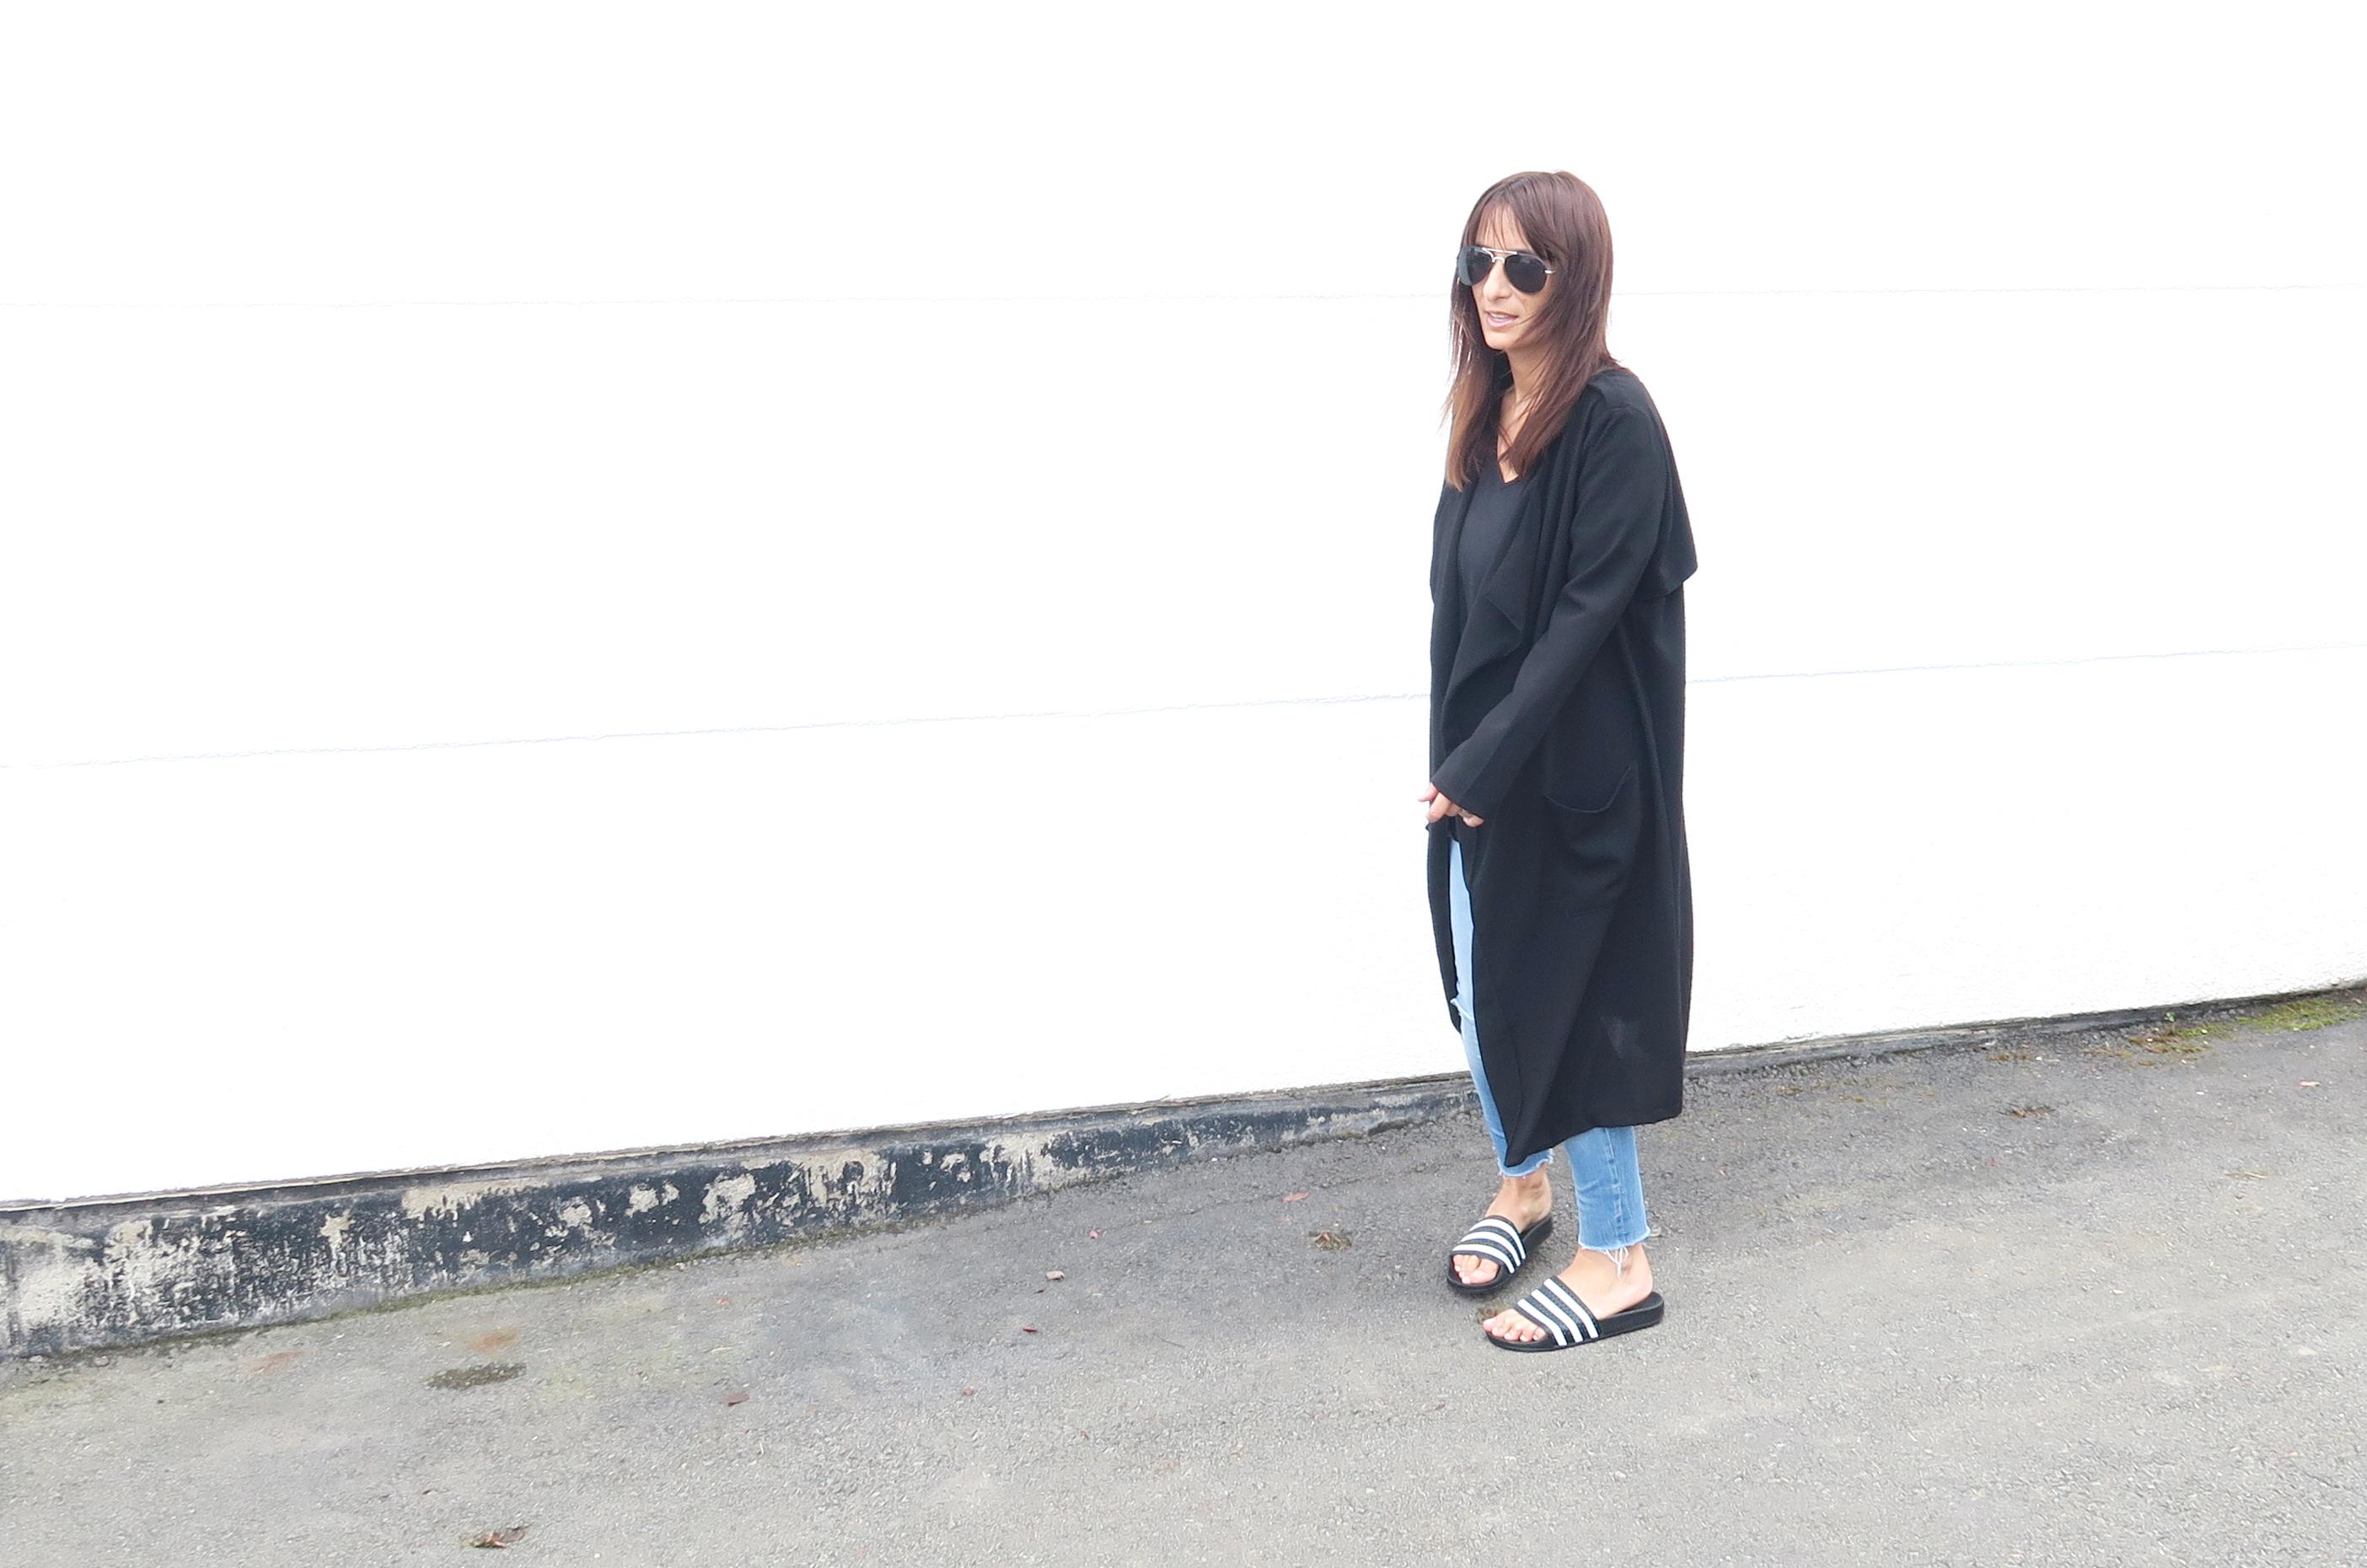 Adiletten-streetstyle-streetfashion-modesalat-fashion-outfit-blogger-2